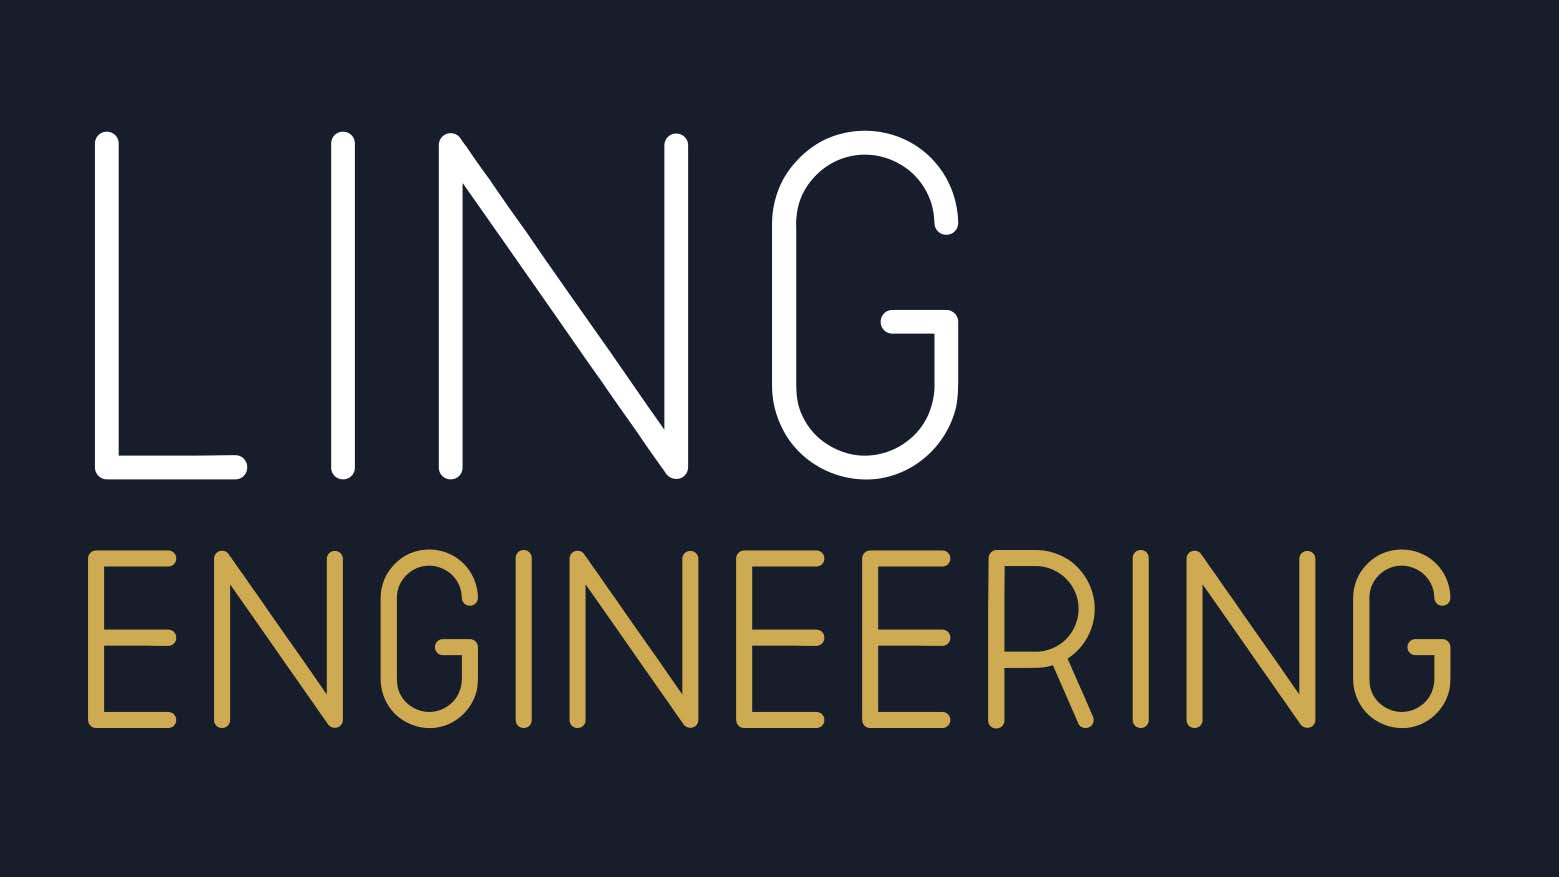 Ling Engineering